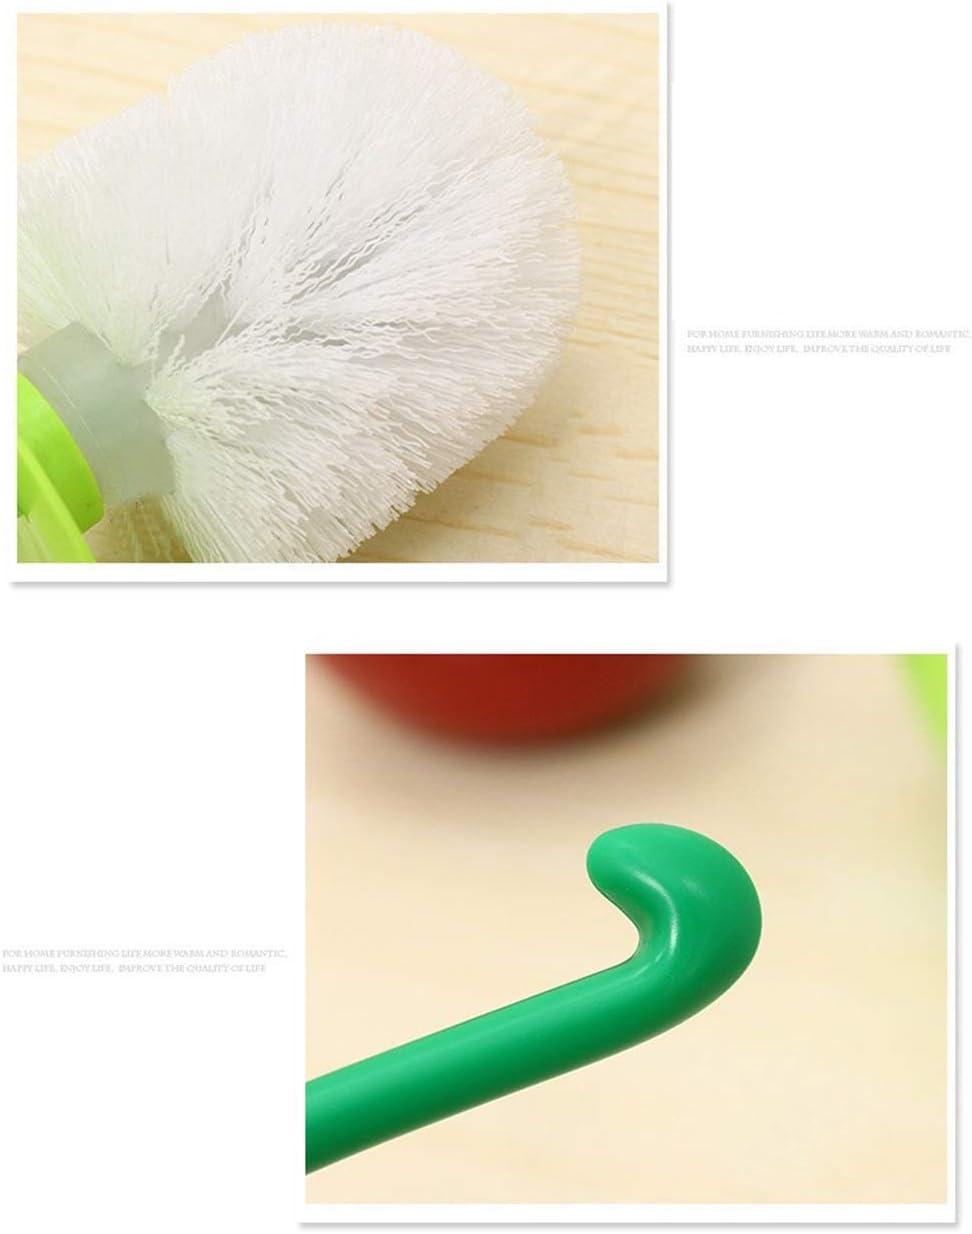 1 Pack Heavy Base Clean Bowl Hideway Compact Holder Strong Bristles for Bathroom Toilet(1 Brush,1 Holder) DORA BRIDAL Toilet Plunger Brush Hold Combo Set